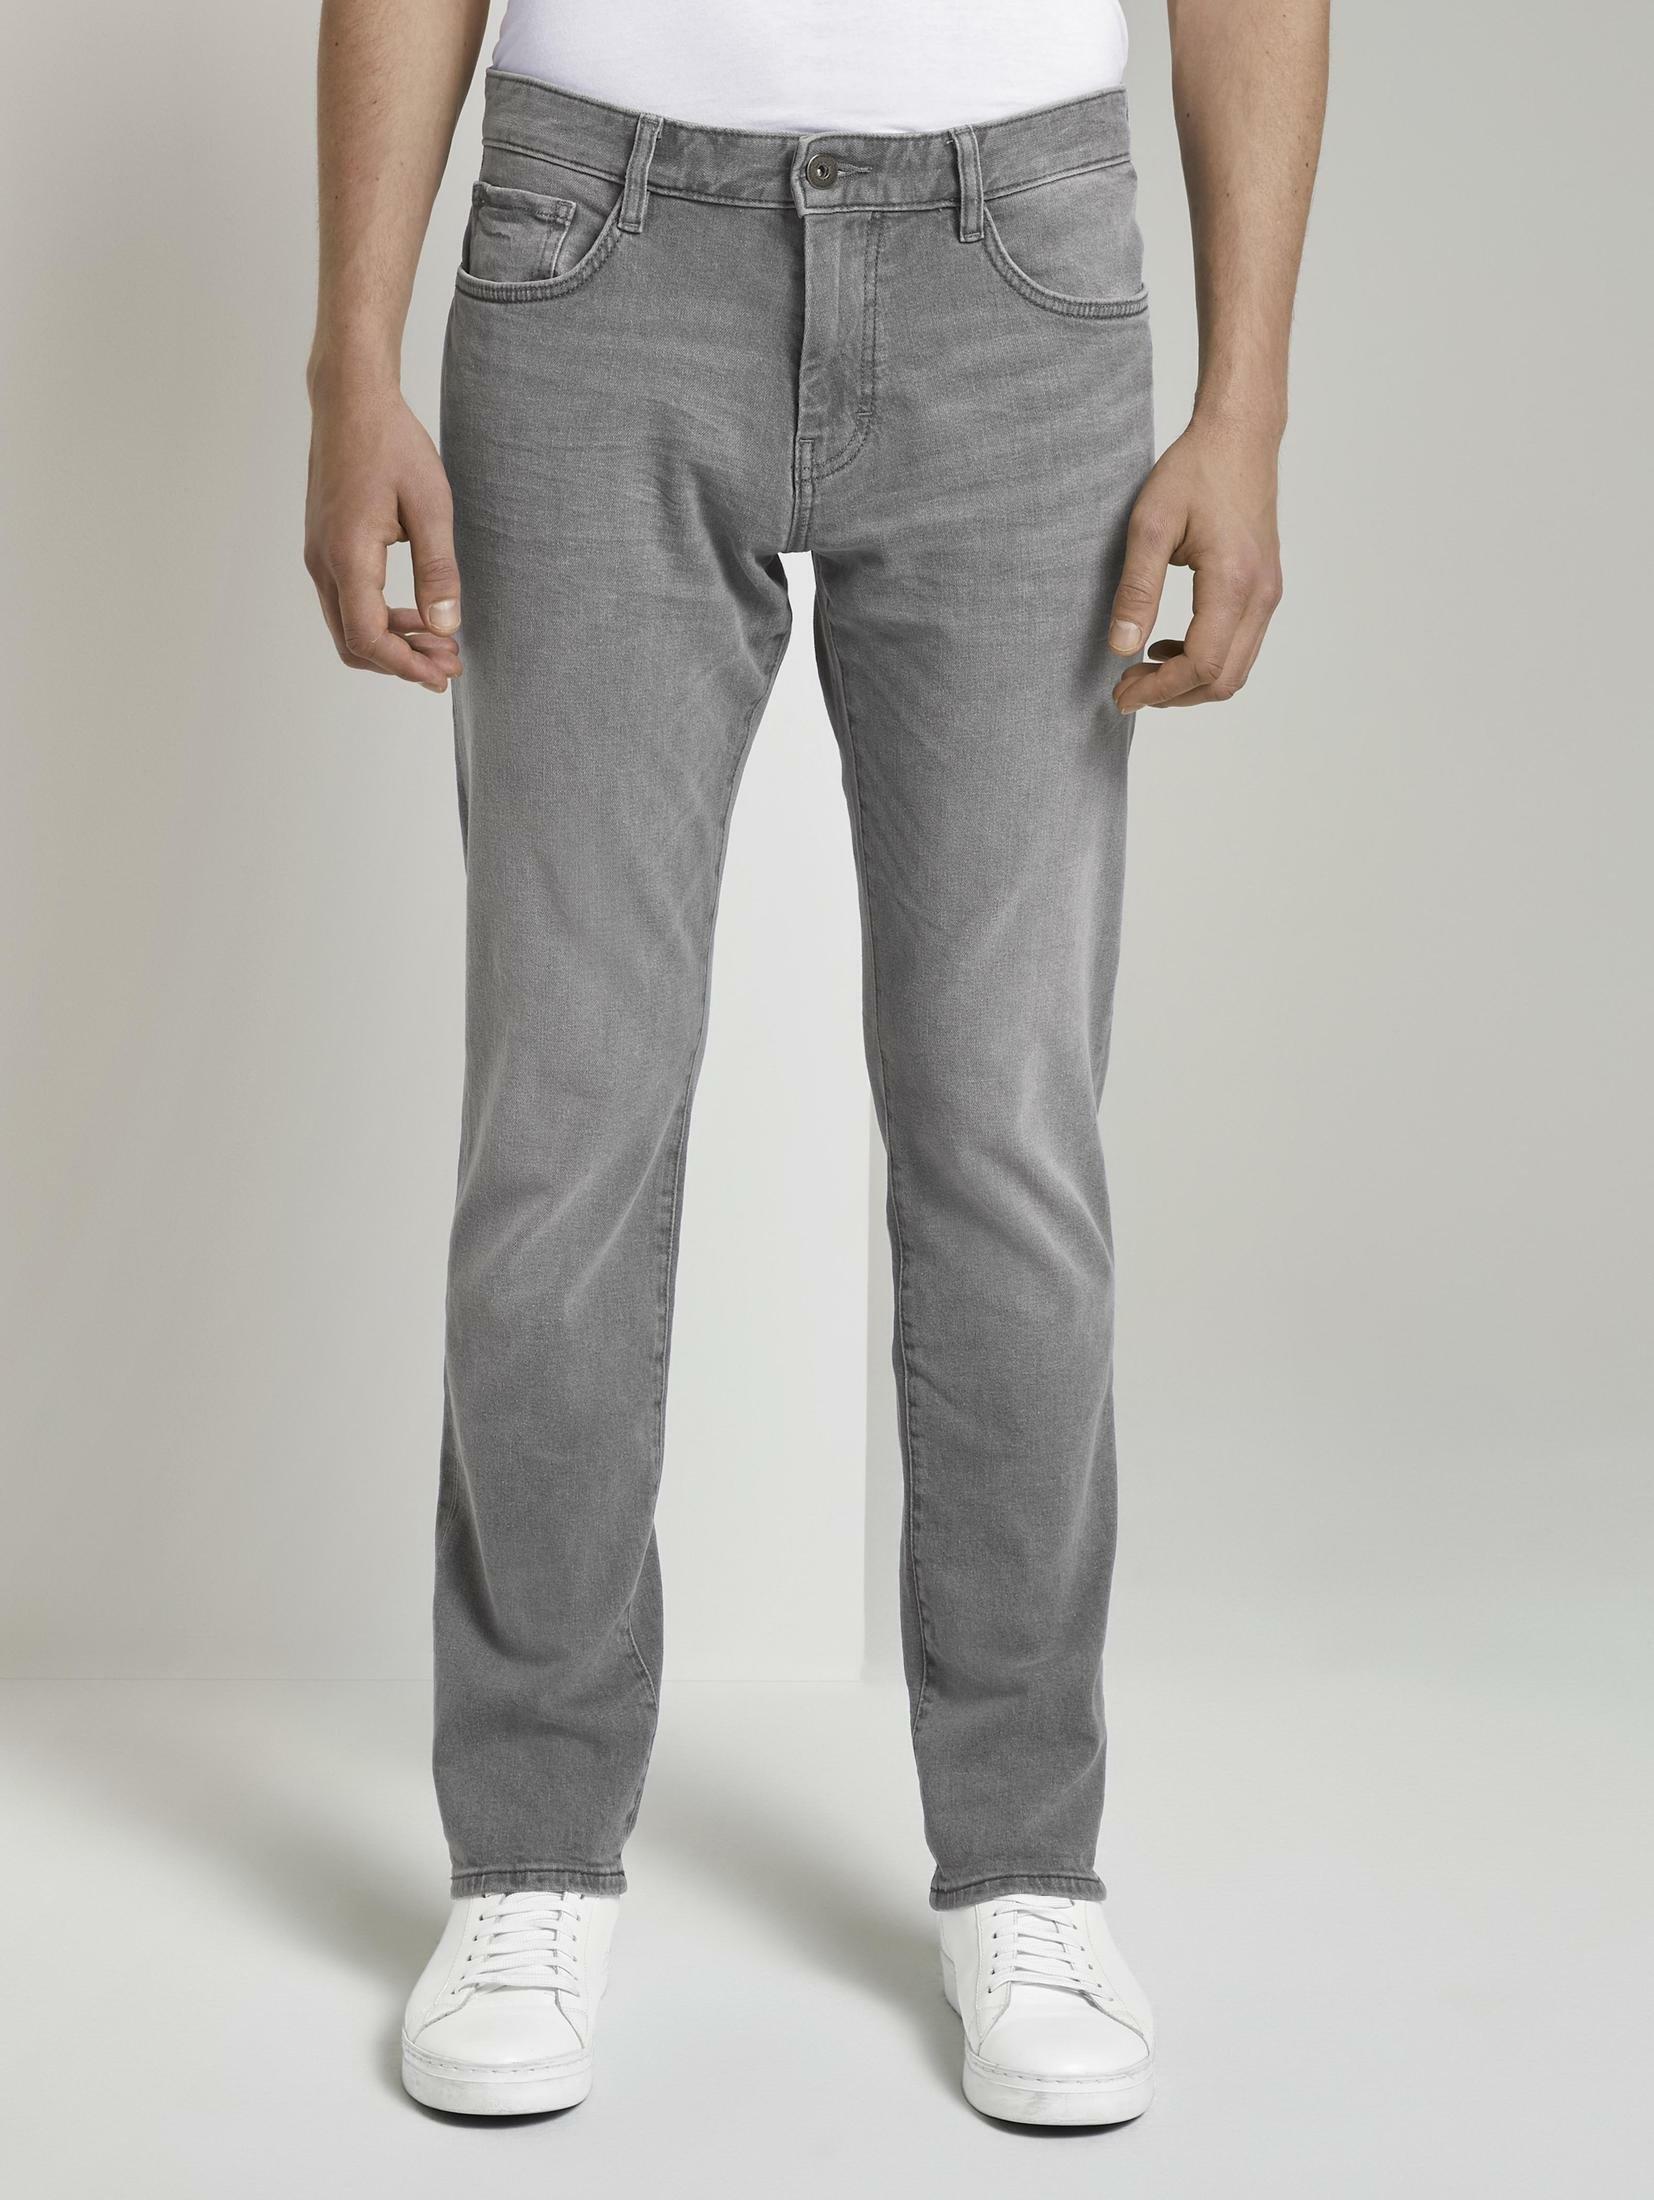 TOM TAILOR slim fit jeans »Josh Regular Slim Jeans« - gratis ruilen op otto.nl